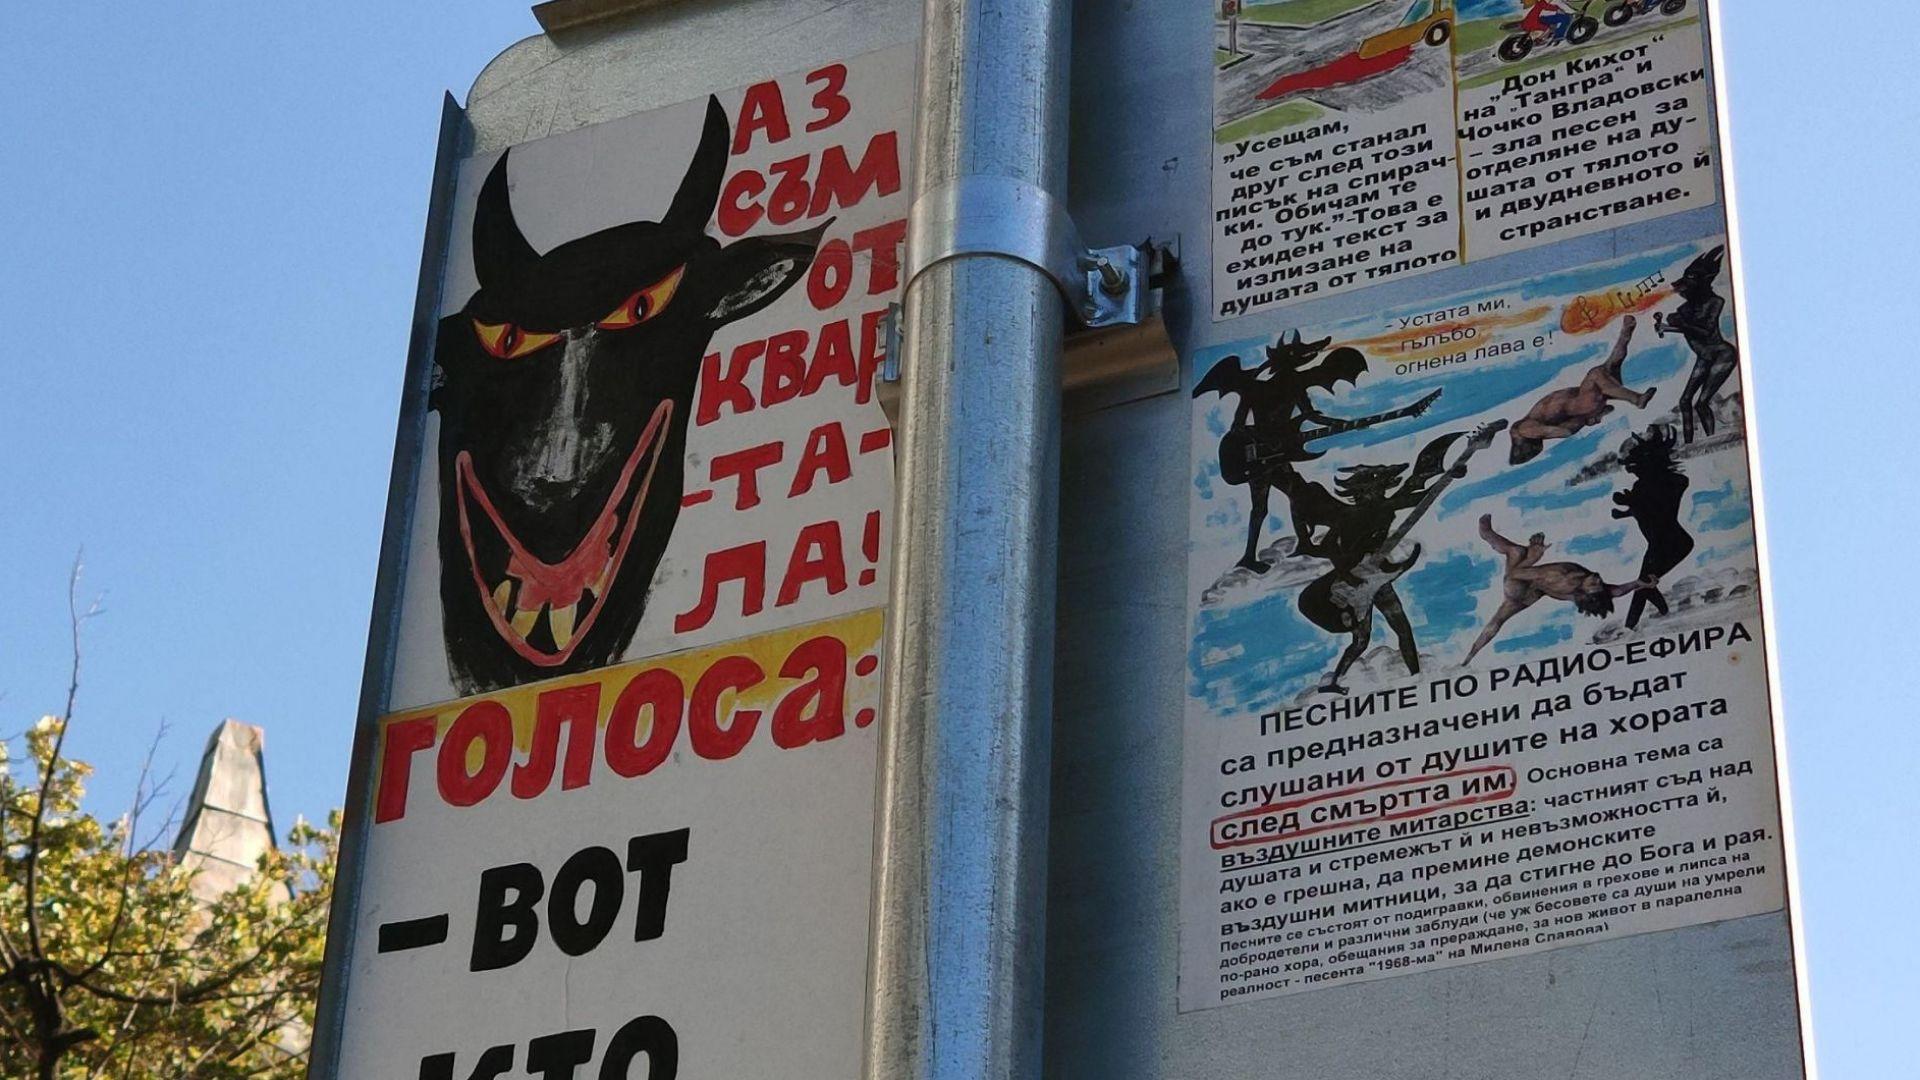 Бабини демони завладяха Варна (снимки)